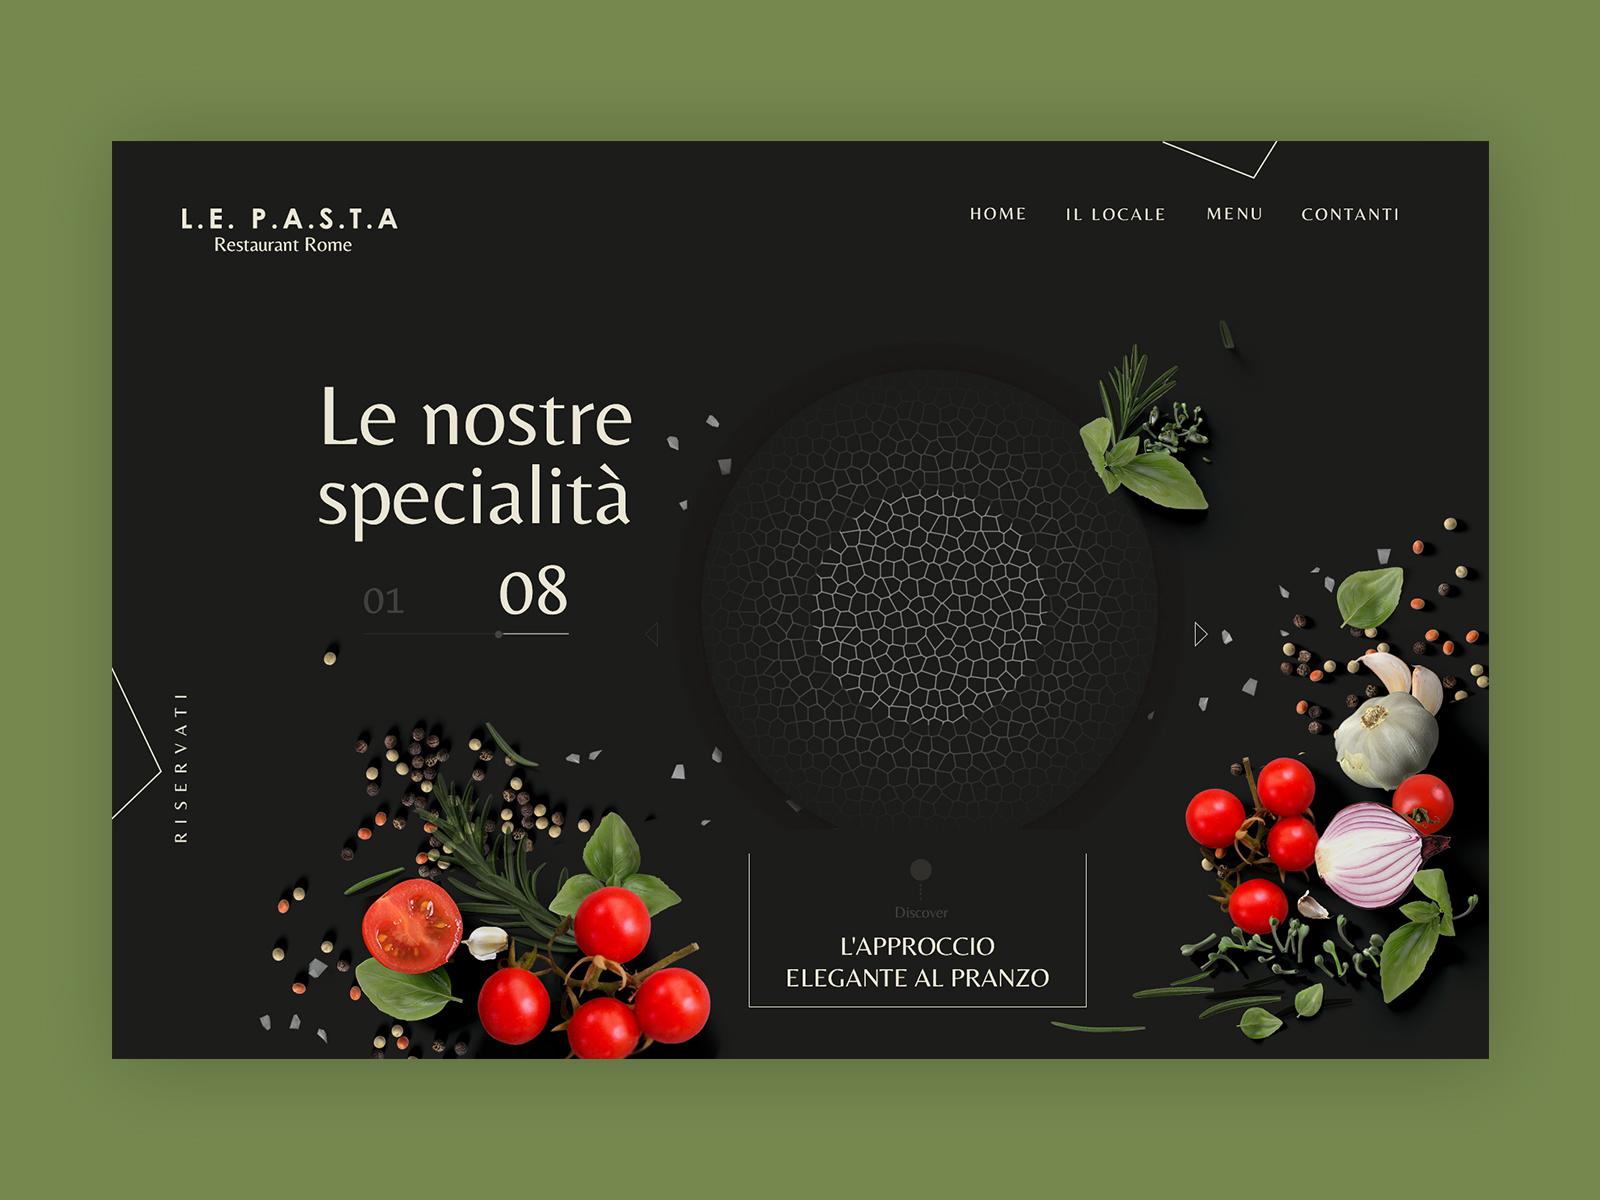 Retaurant pasta  web design concepts 010 19